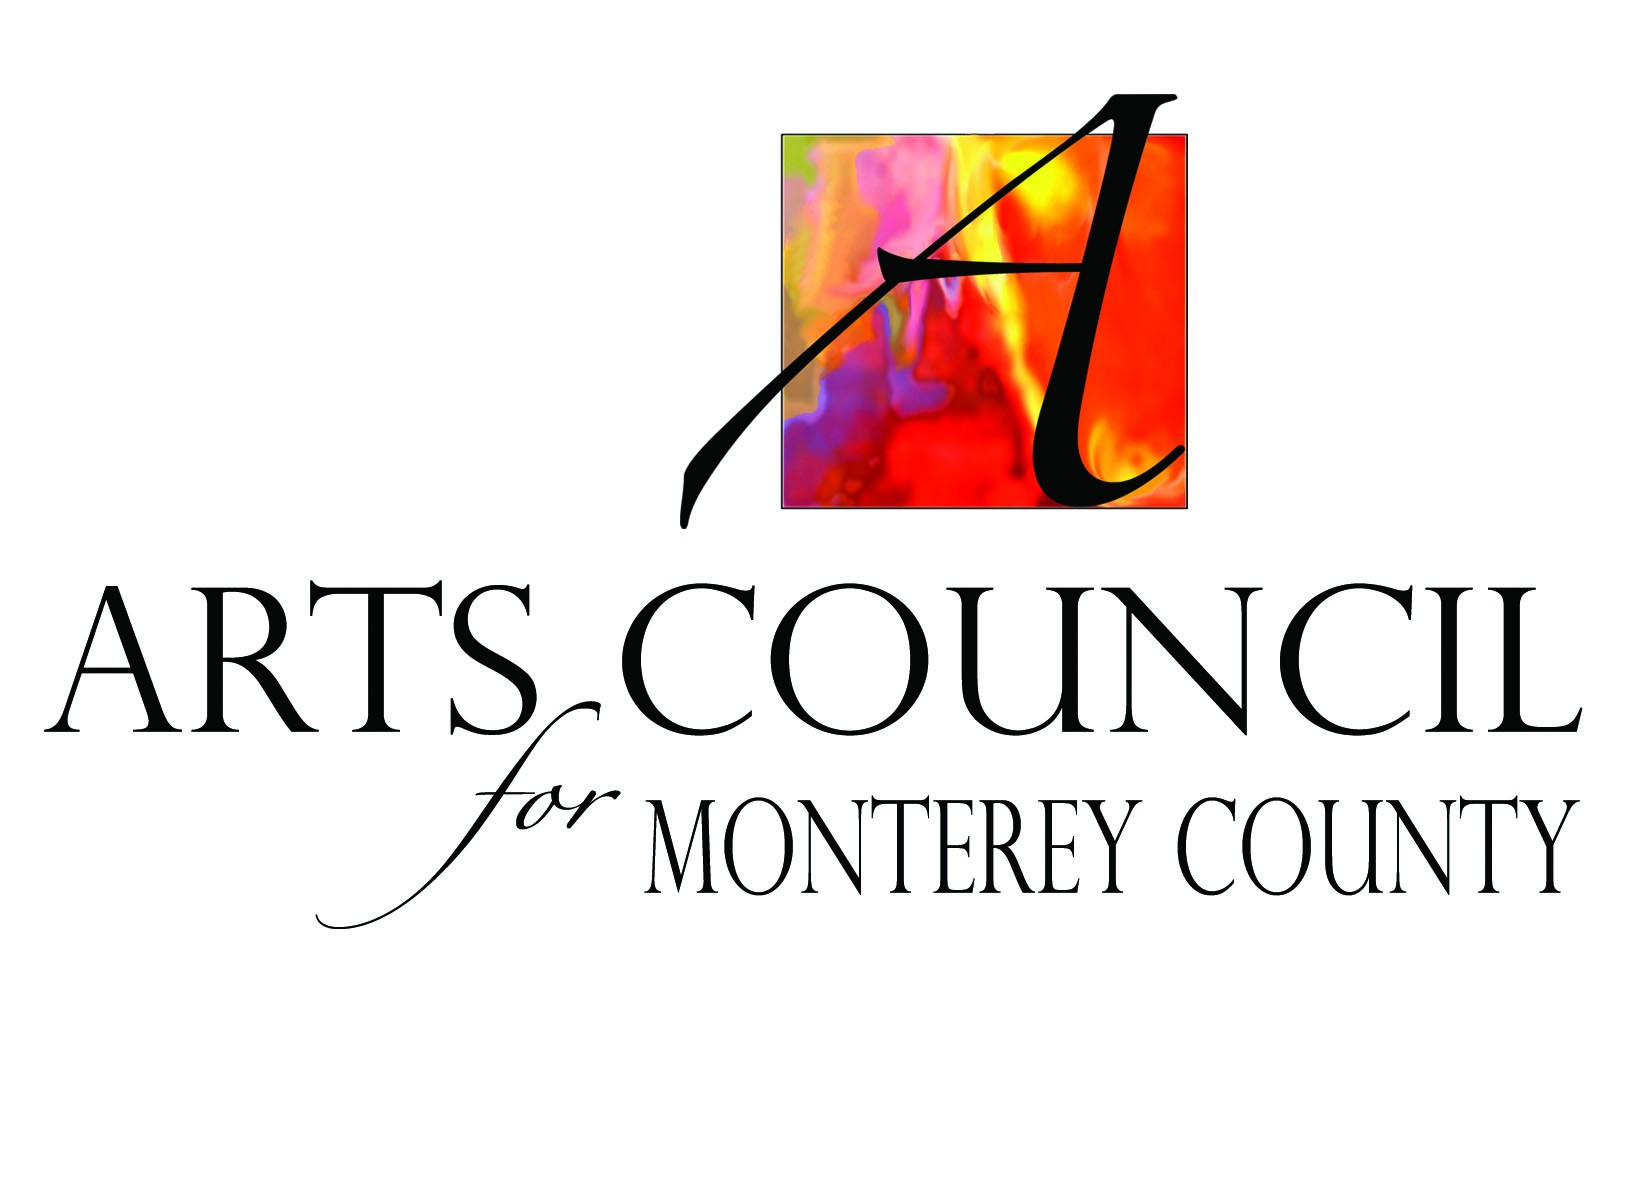 Arts Council for Monterey County logo